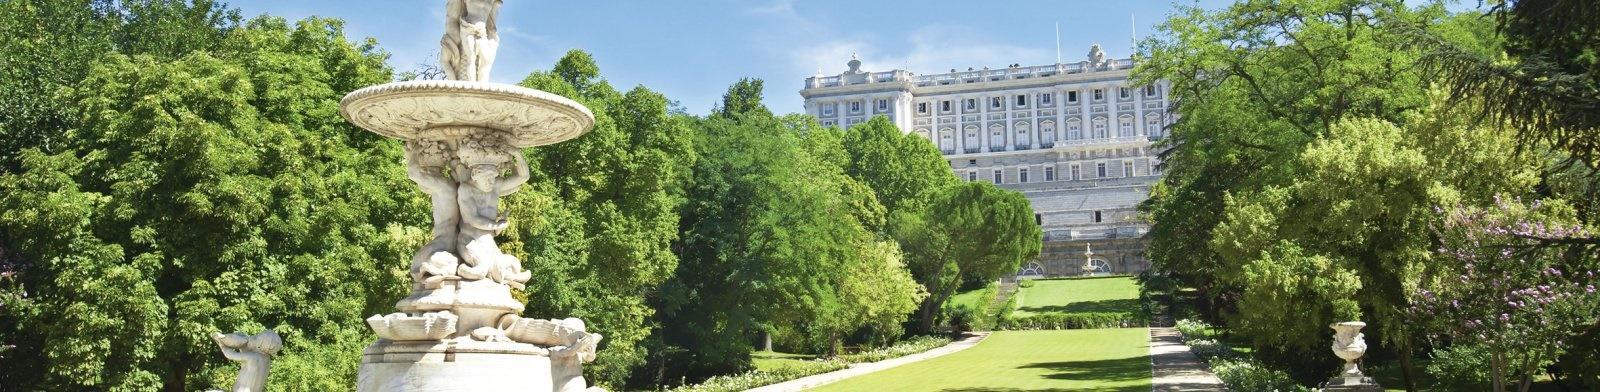 Royal Palace Gardens, Madrid